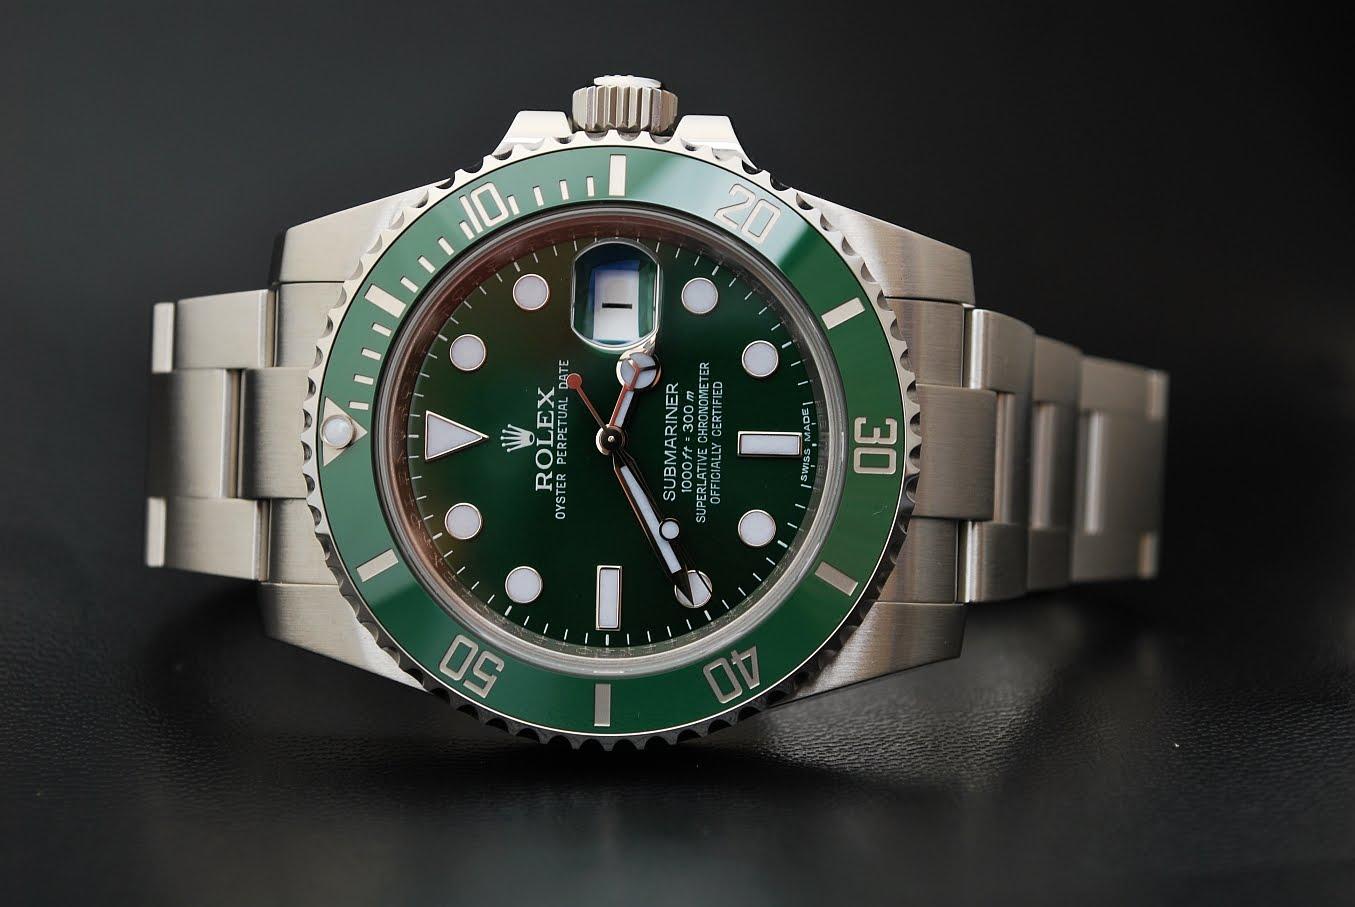 Naziv: Rolex 116610 LV b.jpg, pregleda: 2731, veličina: 108,4 KB